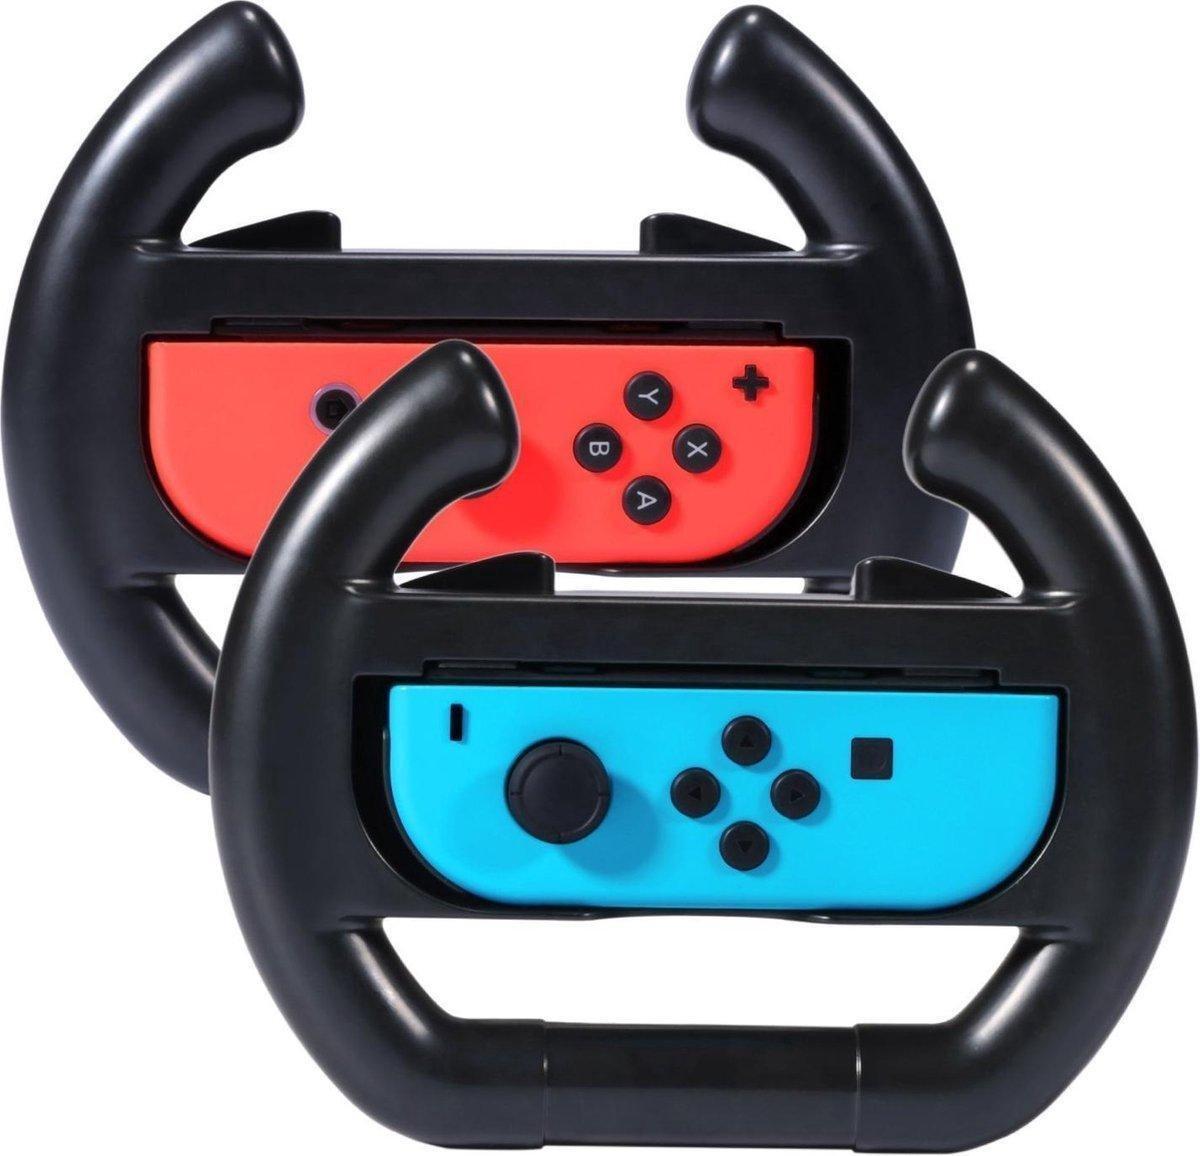 Octronic Joy Con Stuur set Nintendo Switch accessoires - 2 stuks - zwart